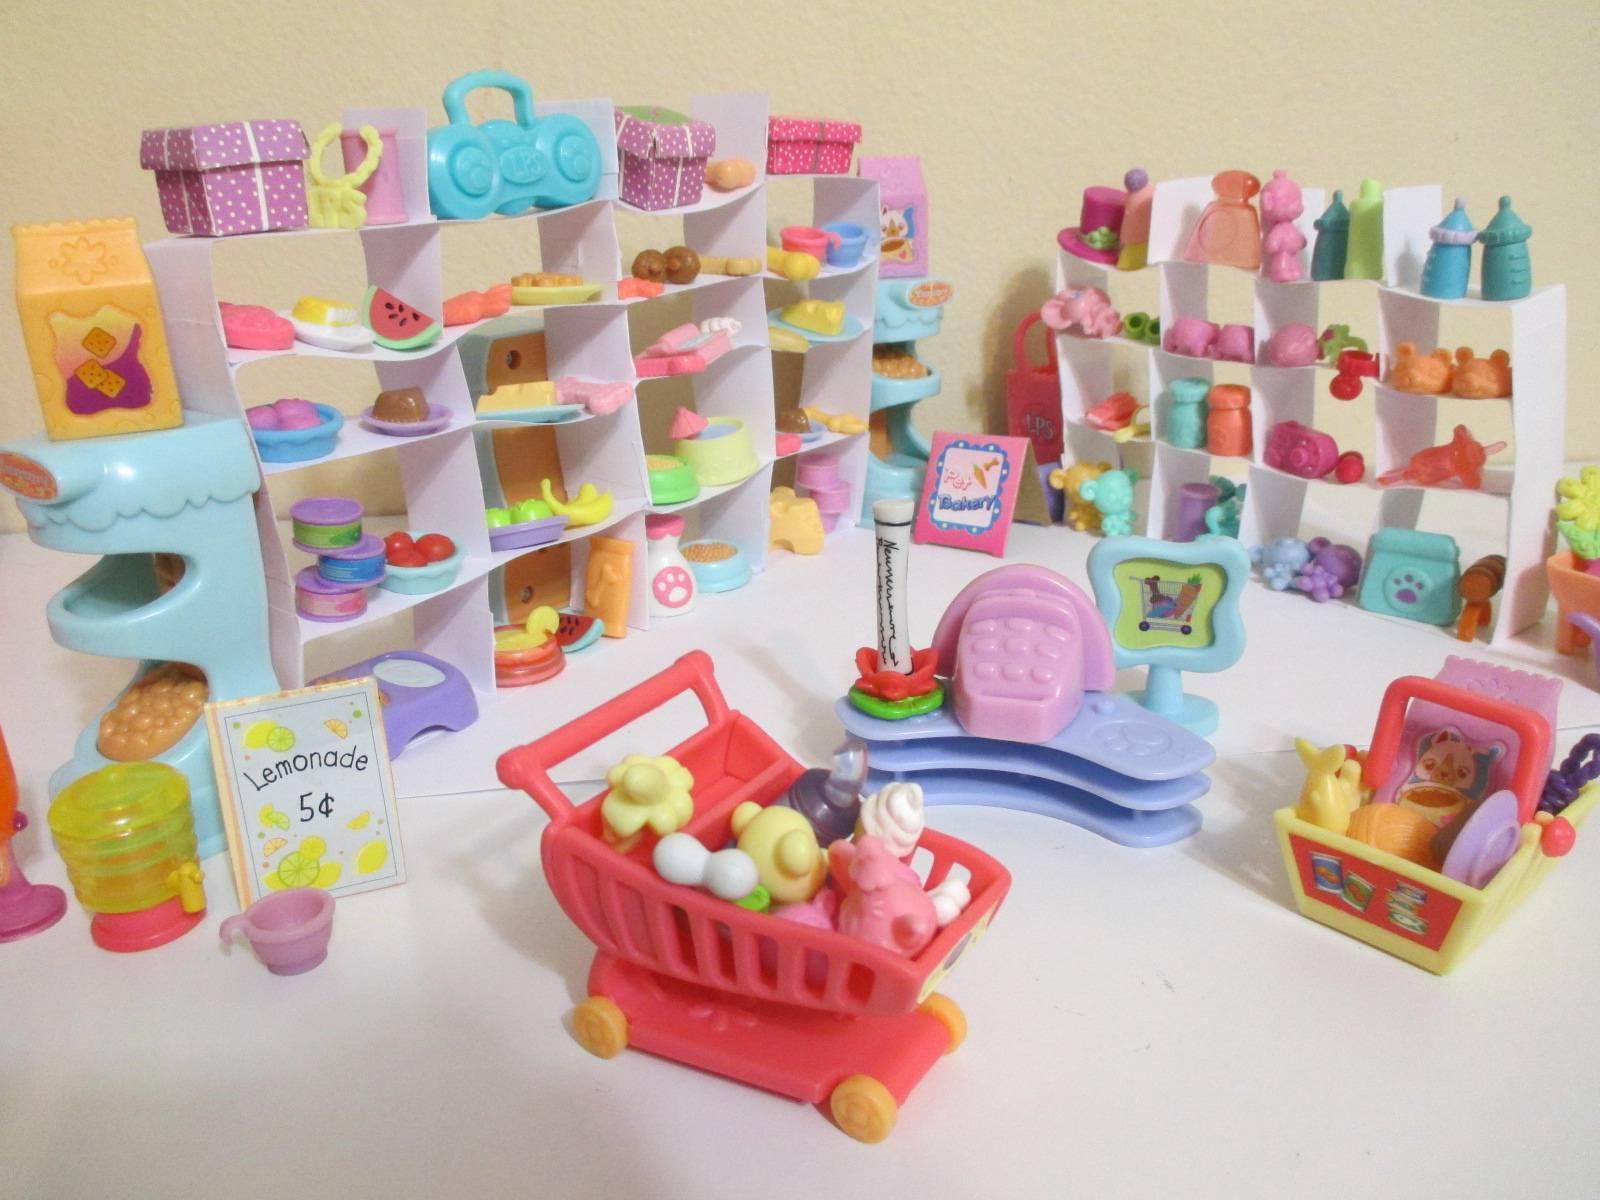 Littlest Pet Shop Lot of 12 Random Surprise Grocery Shopping Food Accessories